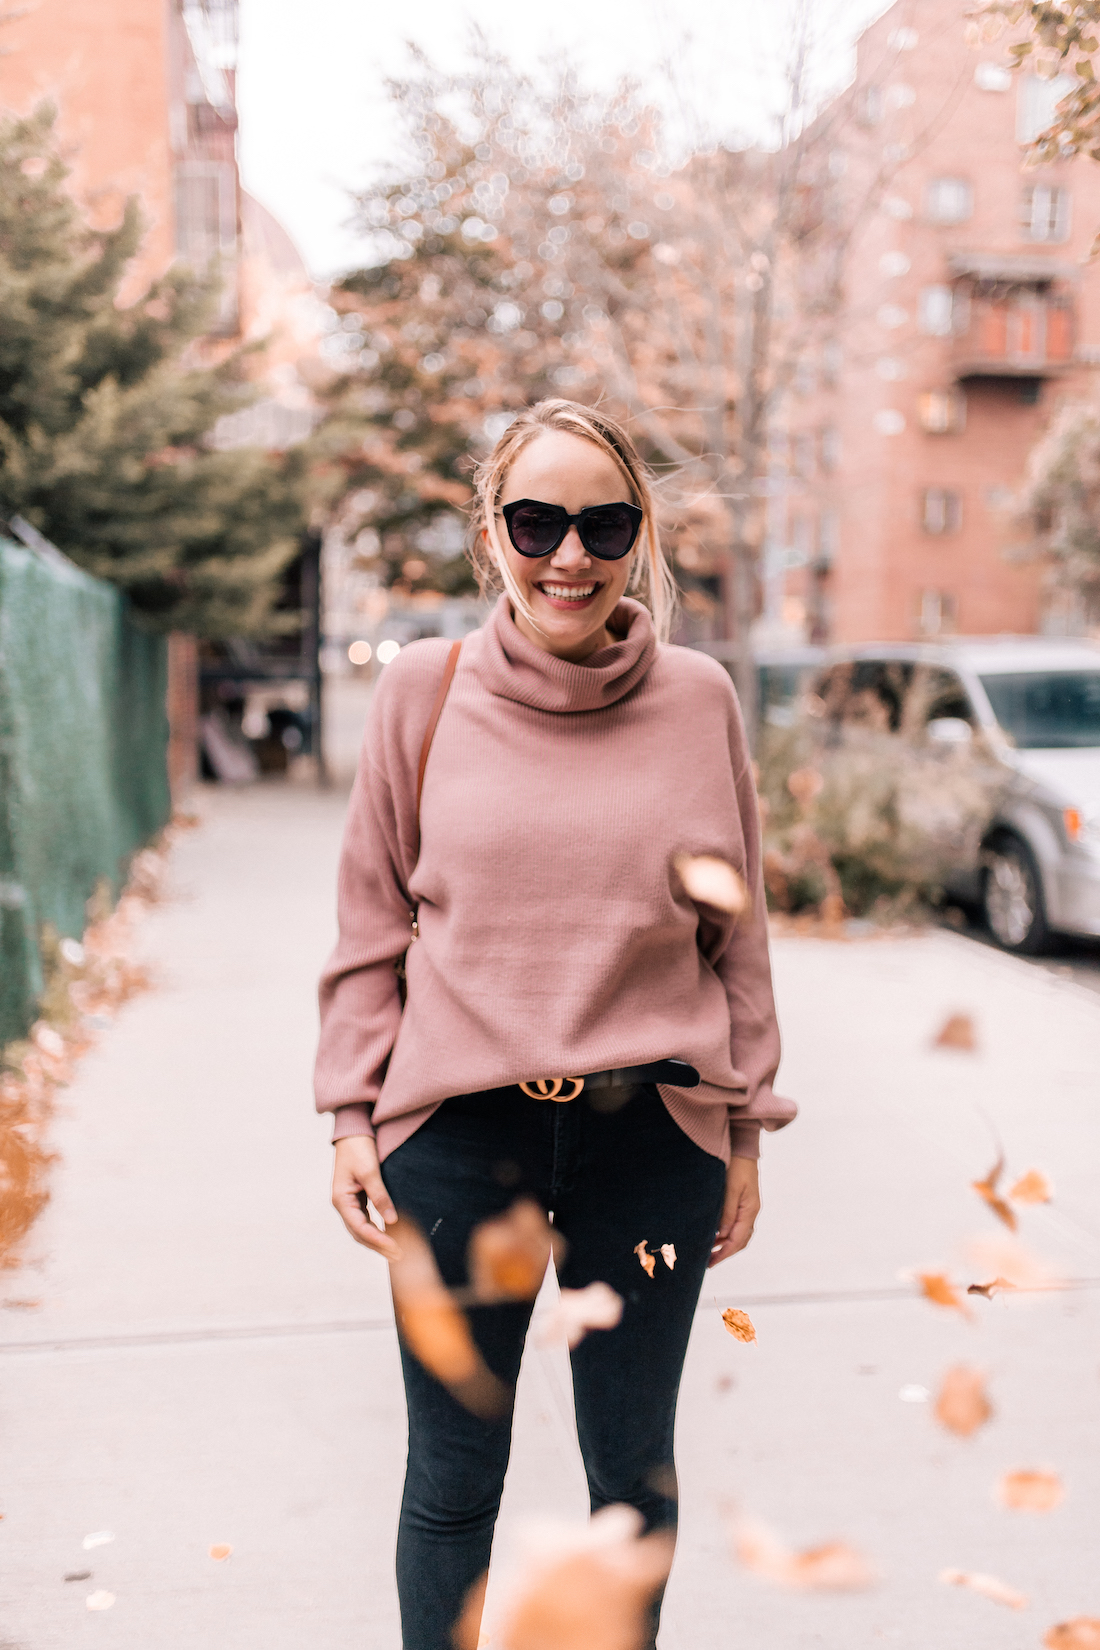 Free People Softly Structured Tunic Sweater //American Eagle Jeans // Gucci Belt // Karen Walker Sunglasses //Charlotte Tilbury Lipstick